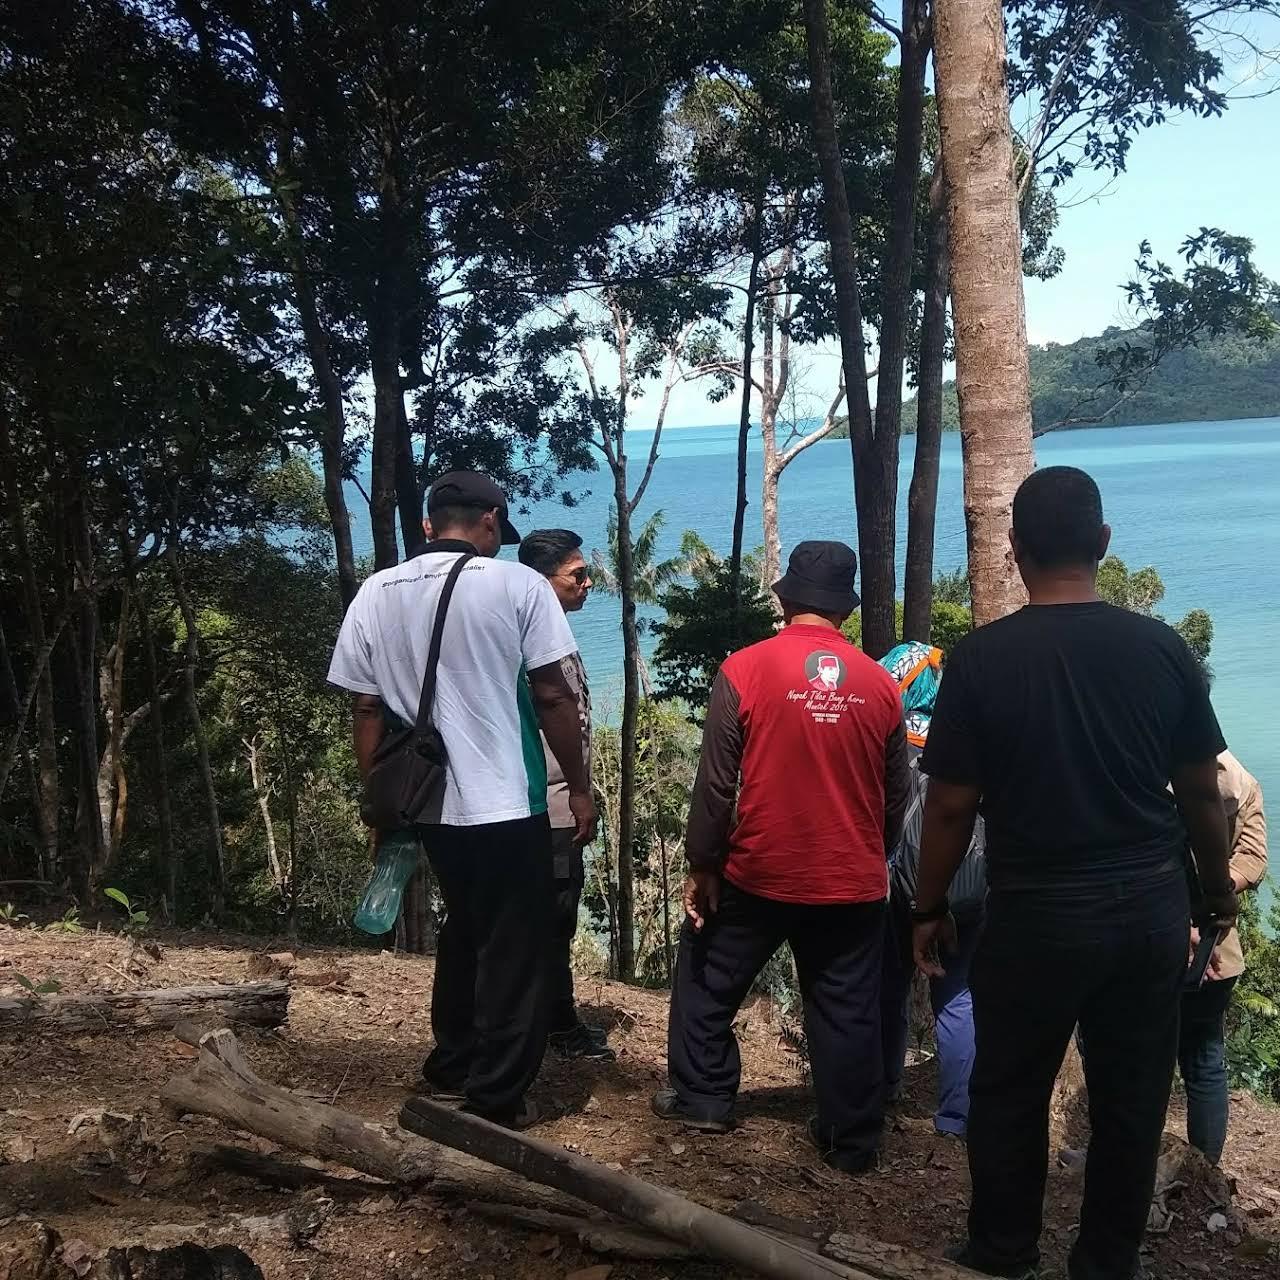 Wisata Pantai Bembang Bukit Telaga Tujuh Tujuan Wisata